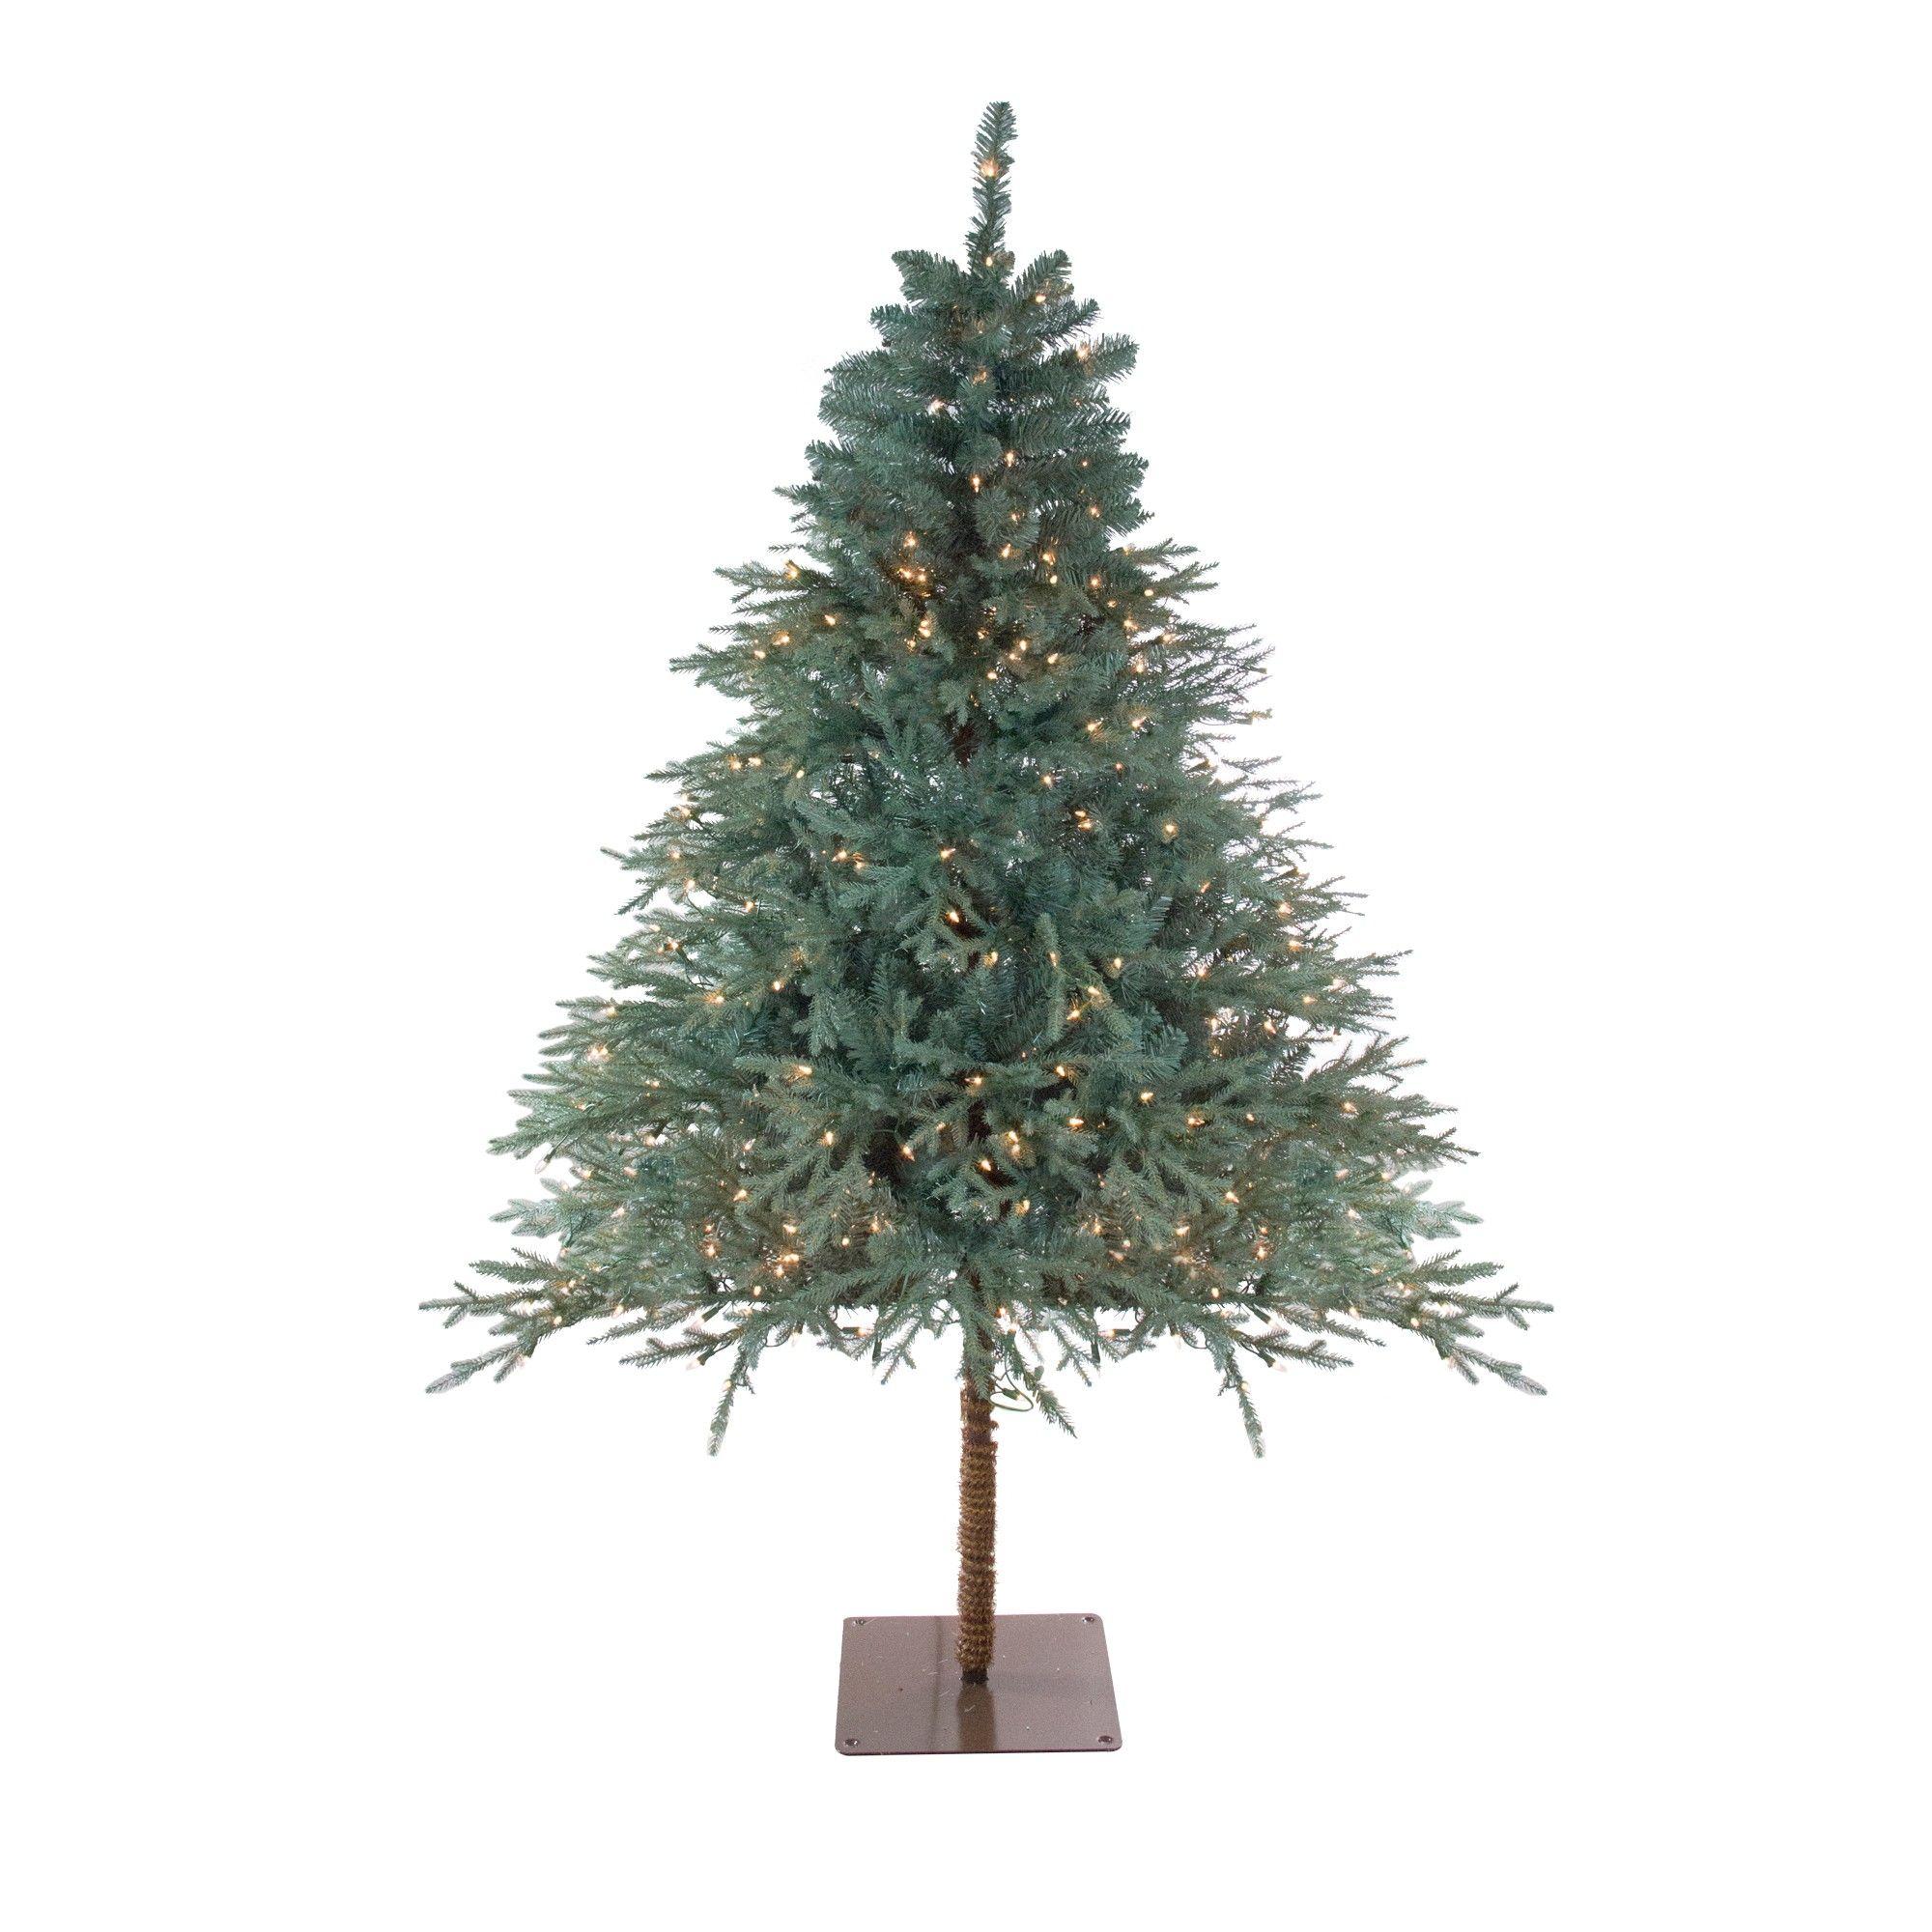 Northlight 7.5' Prelit Artificial Christmas Tree Medium